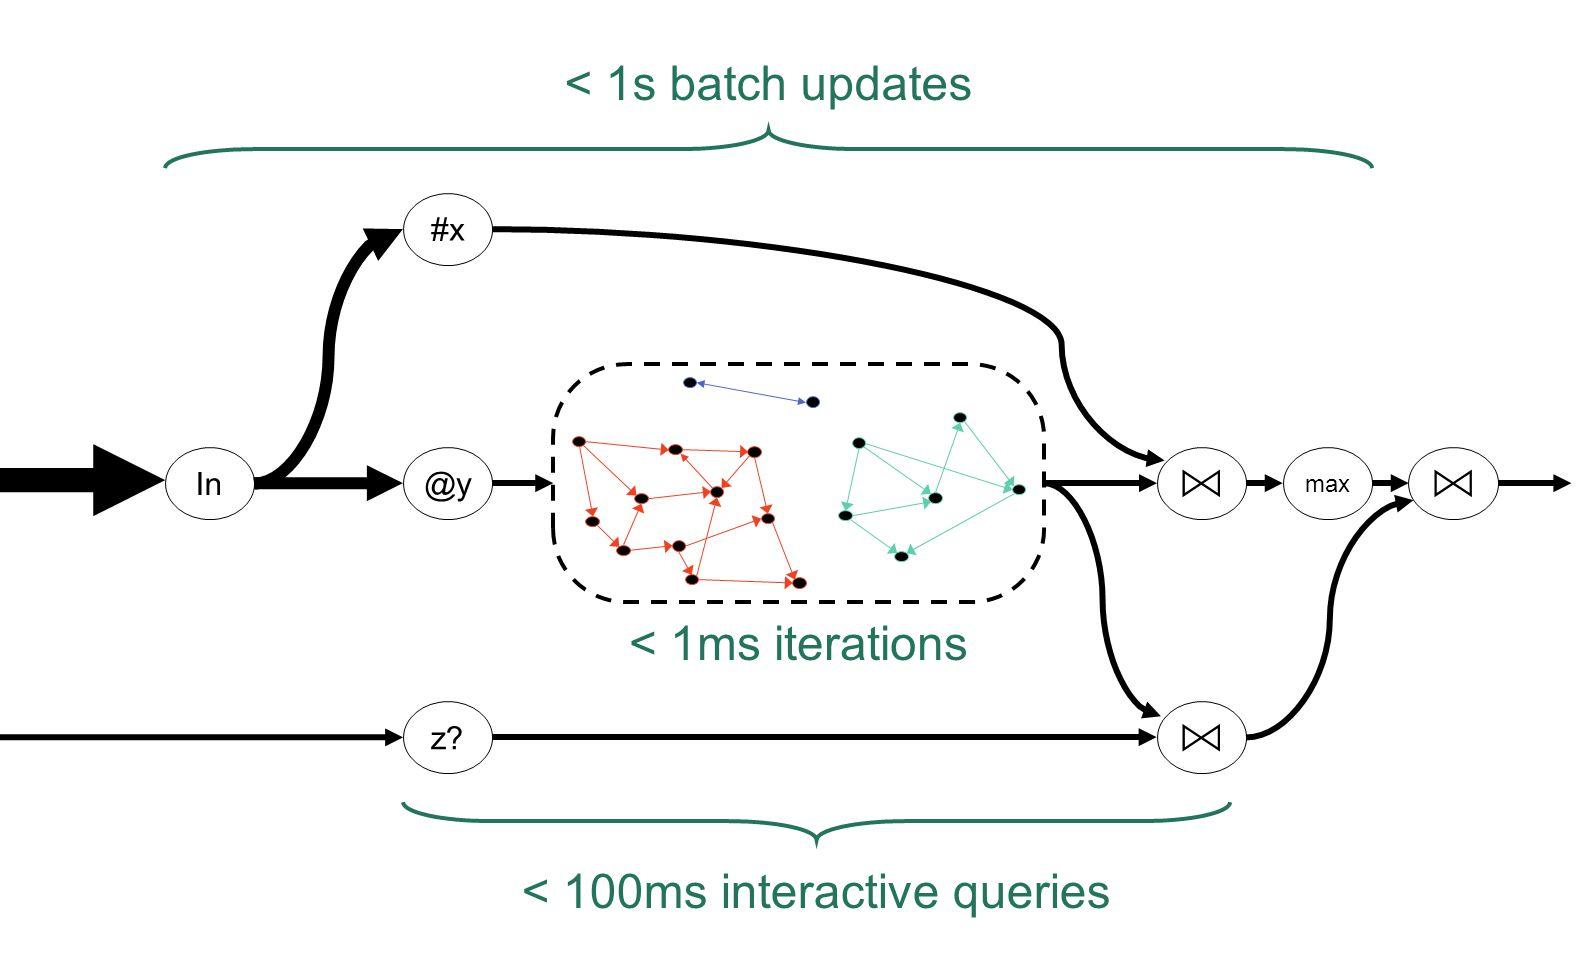 < 100ms interactive queries